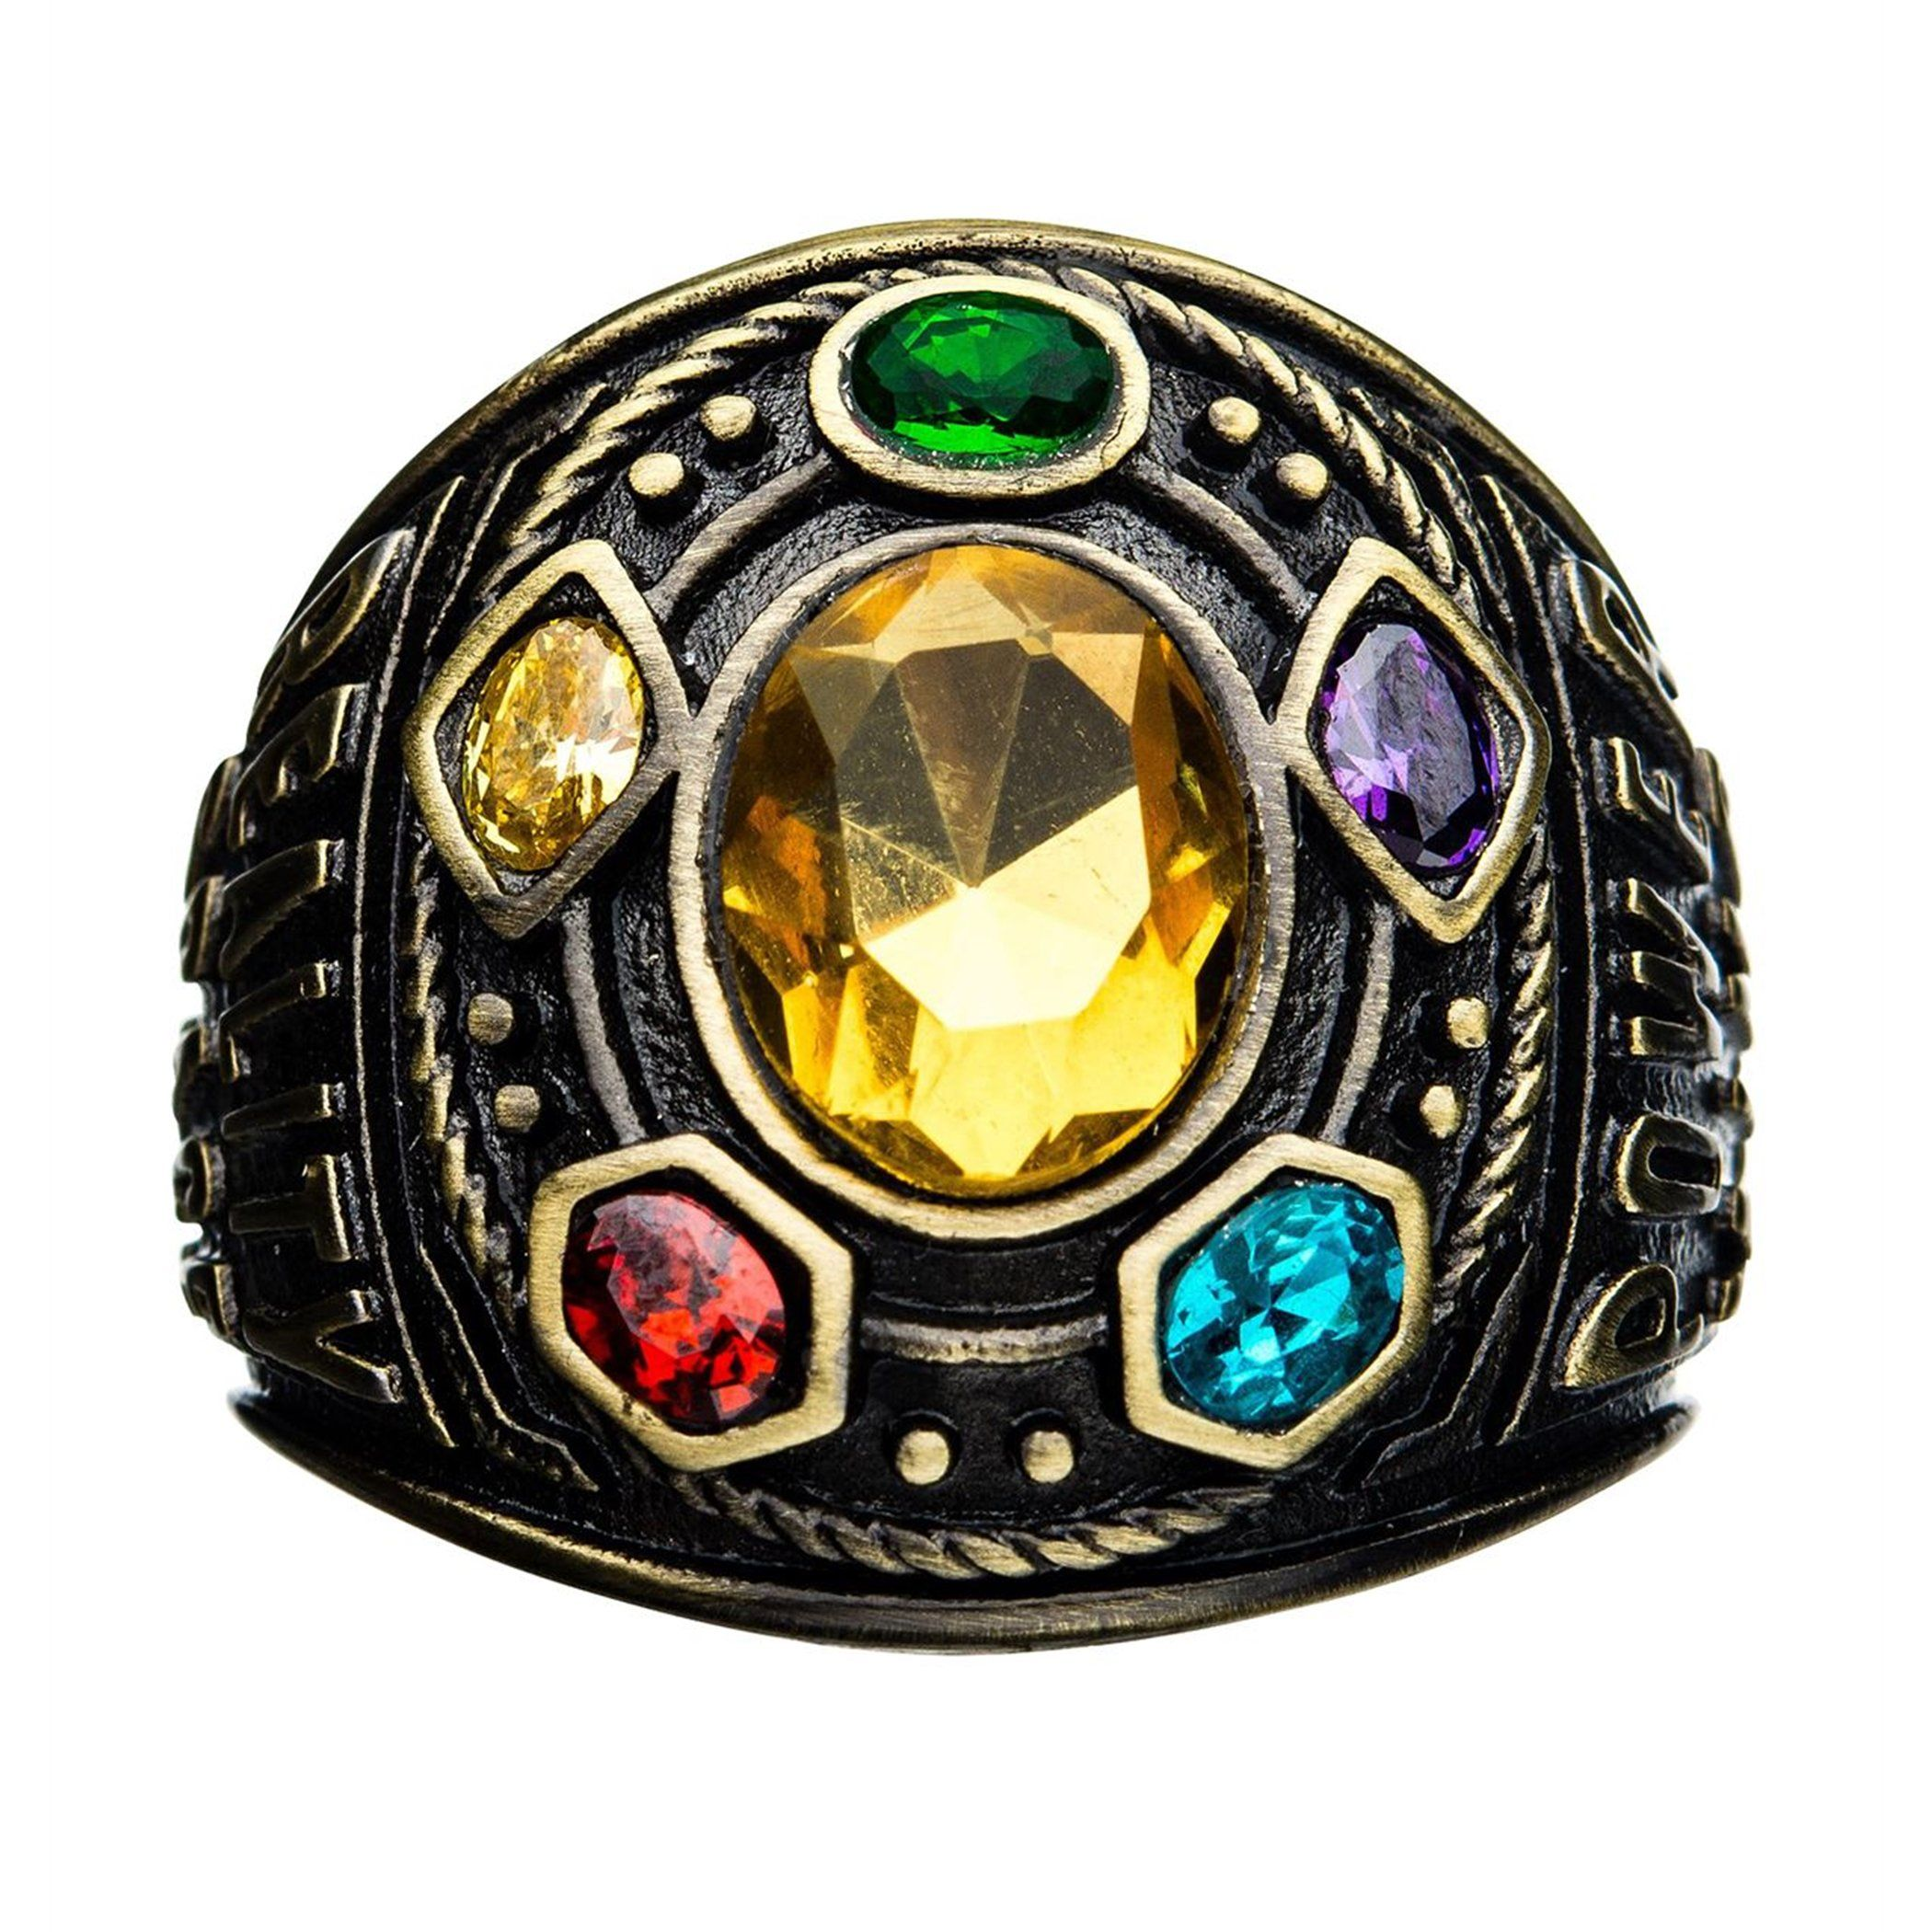 cad59aa800cc8 Infinity Gauntlet Class of Infinite Power Ring in 2019 | Stuff ...